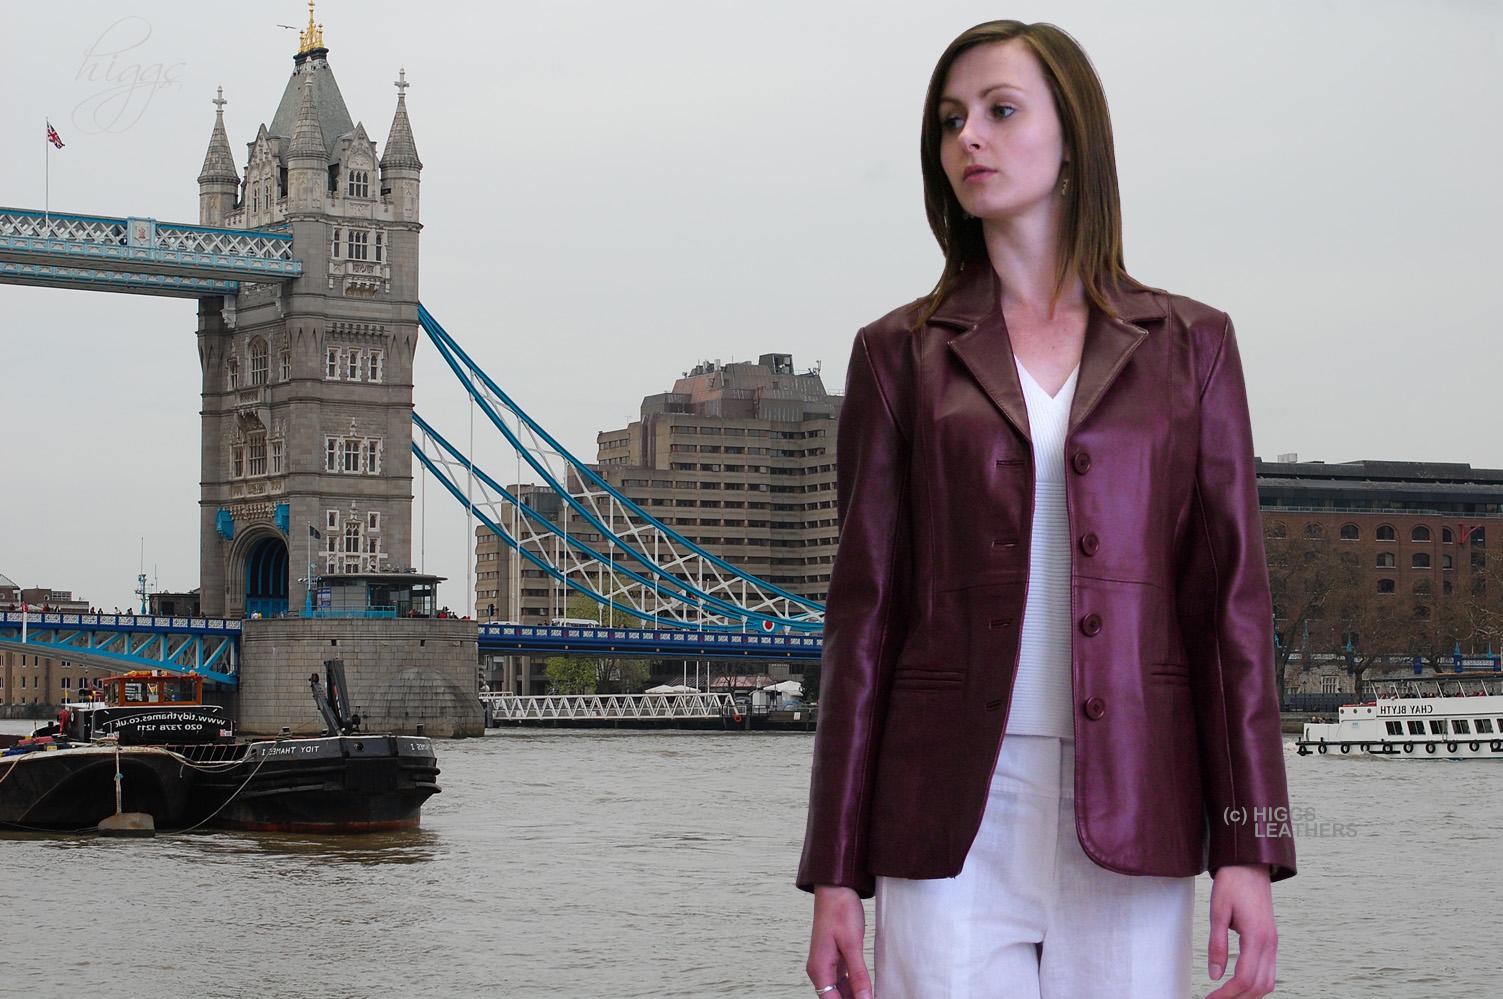 46afbf5c7514 Higgs Leathers {LAST FEW SAVE £70!} Bron (long blazer style women's